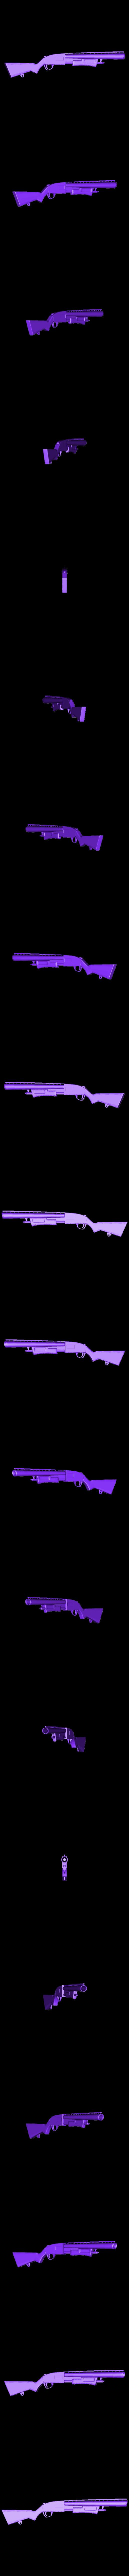 Pump Shotgun Fortnite.stl Download free STL file Pump Shotgun Fortnite • Design to 3D print, detaildesigner